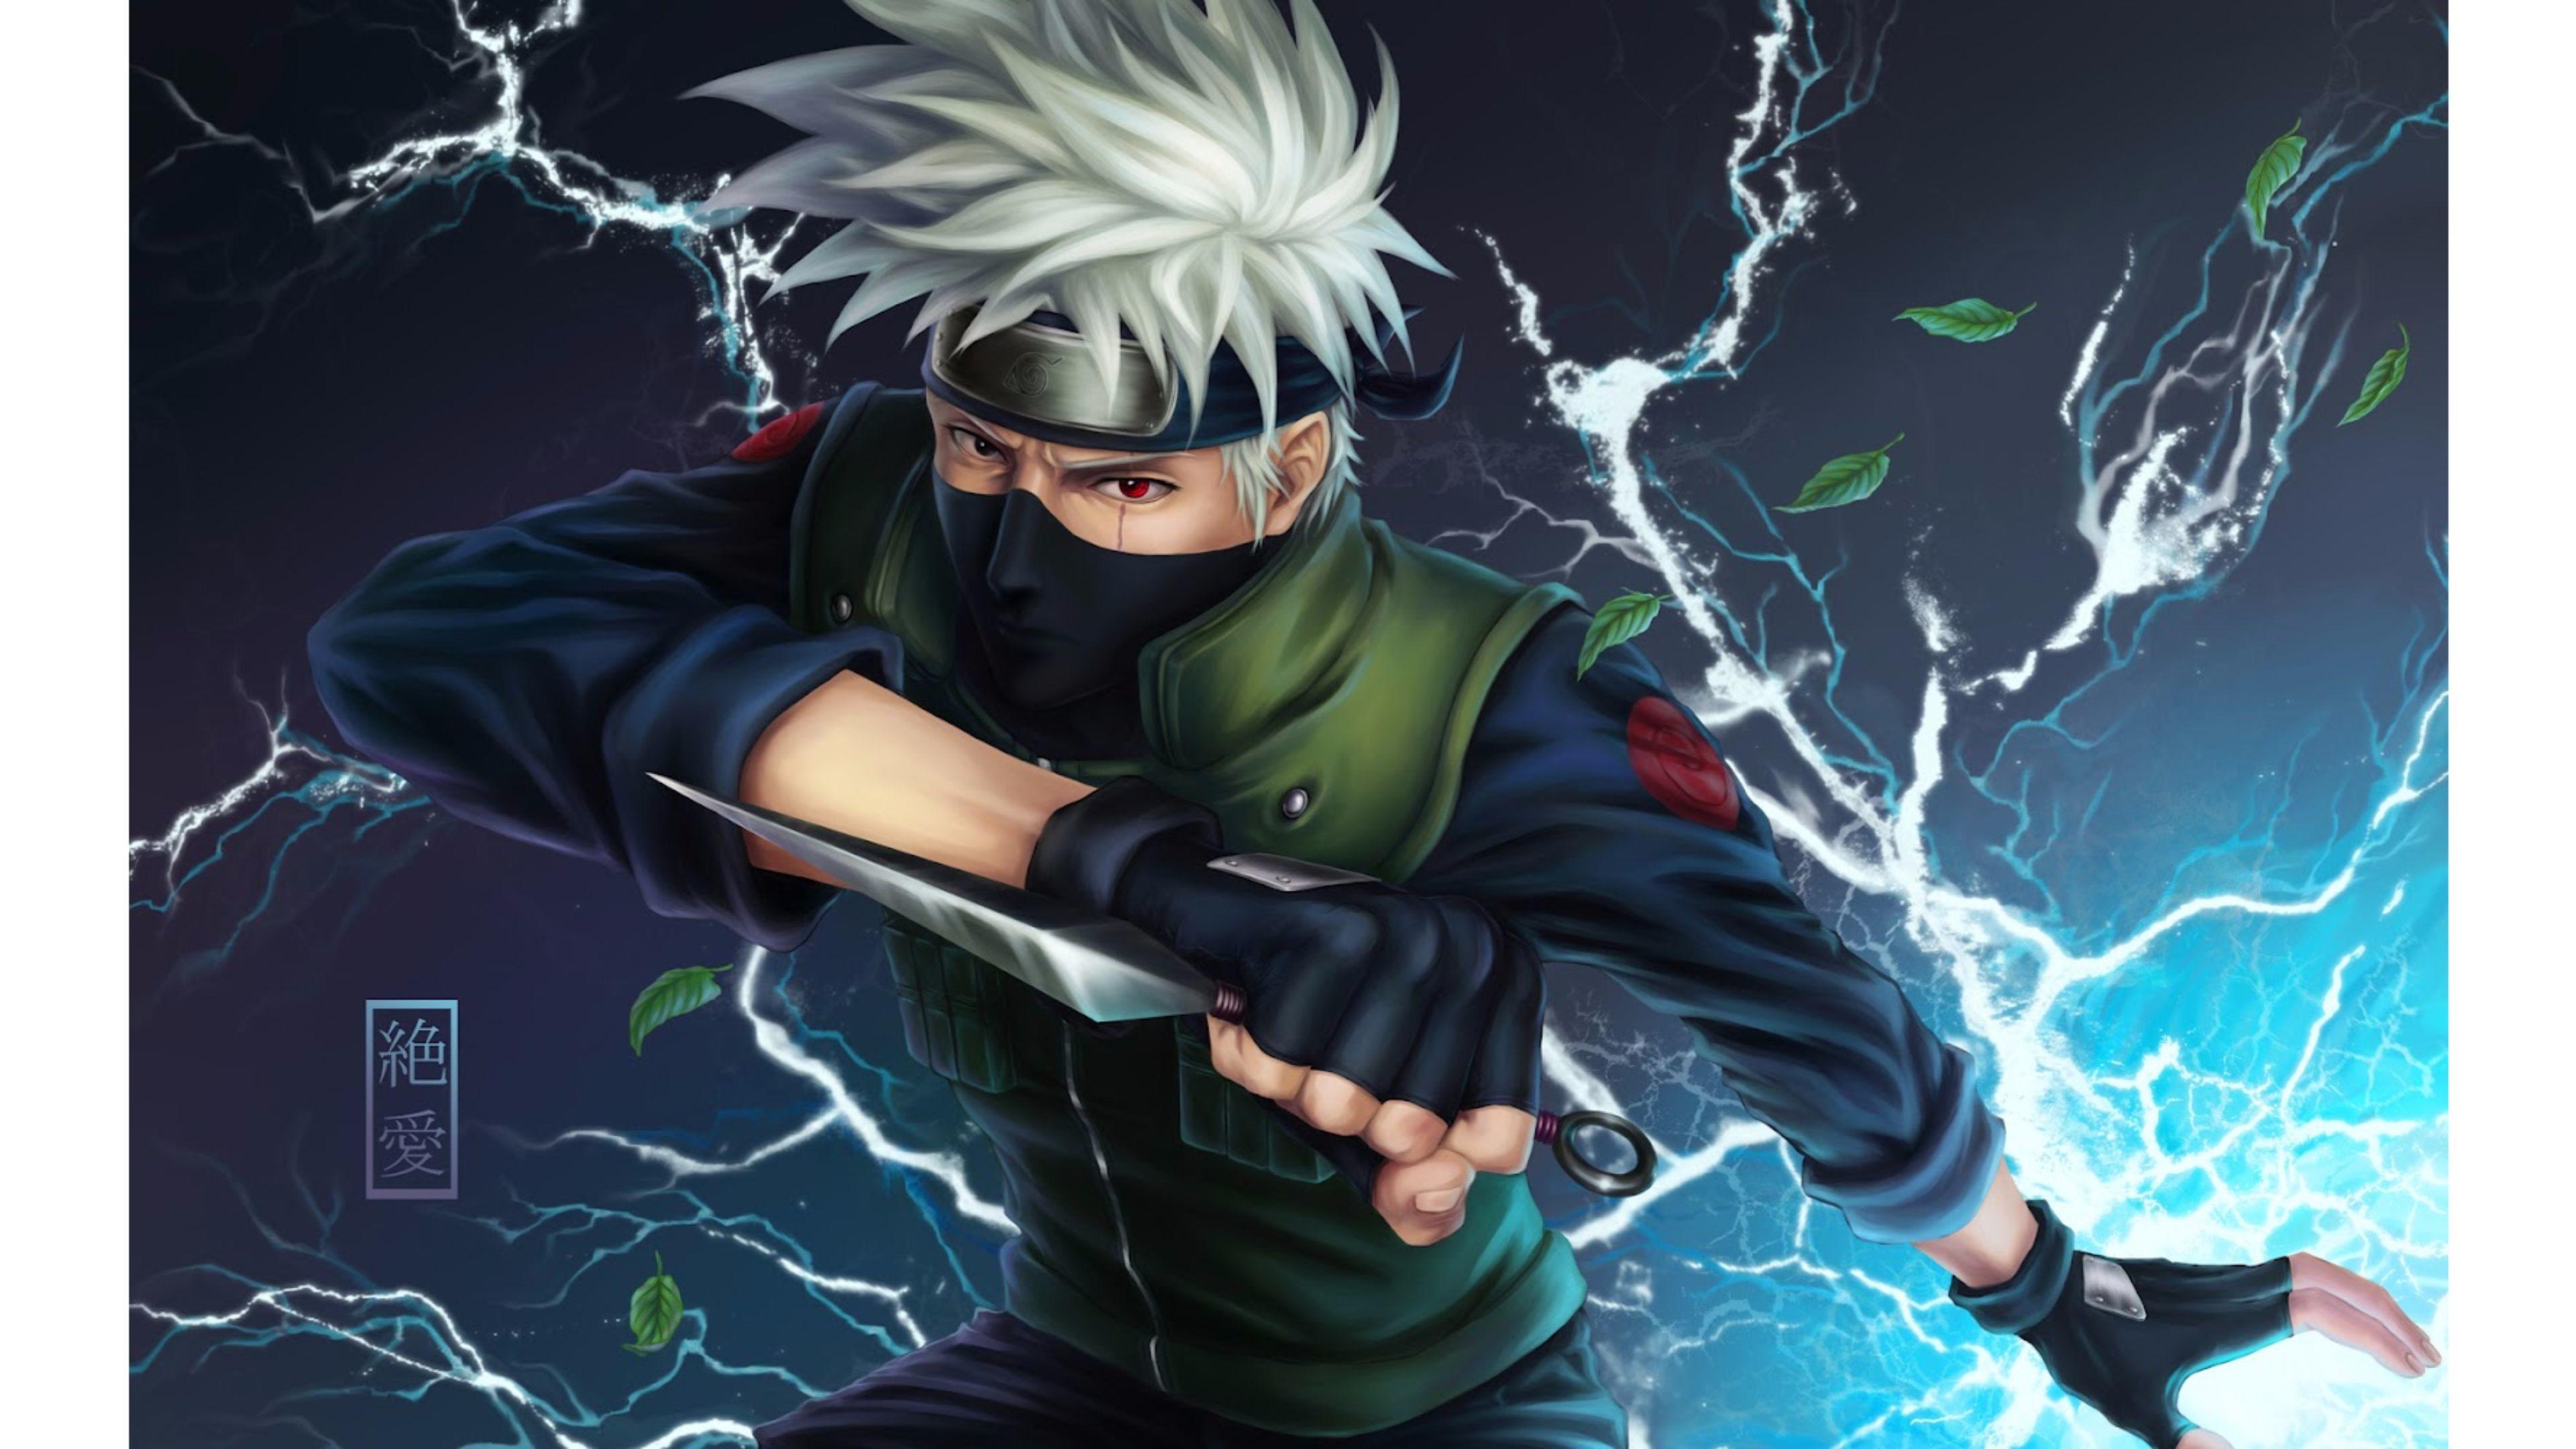 Res: 3840x2160, Ninja 4K Anime Wallpapers | Free 4K Wallpaper